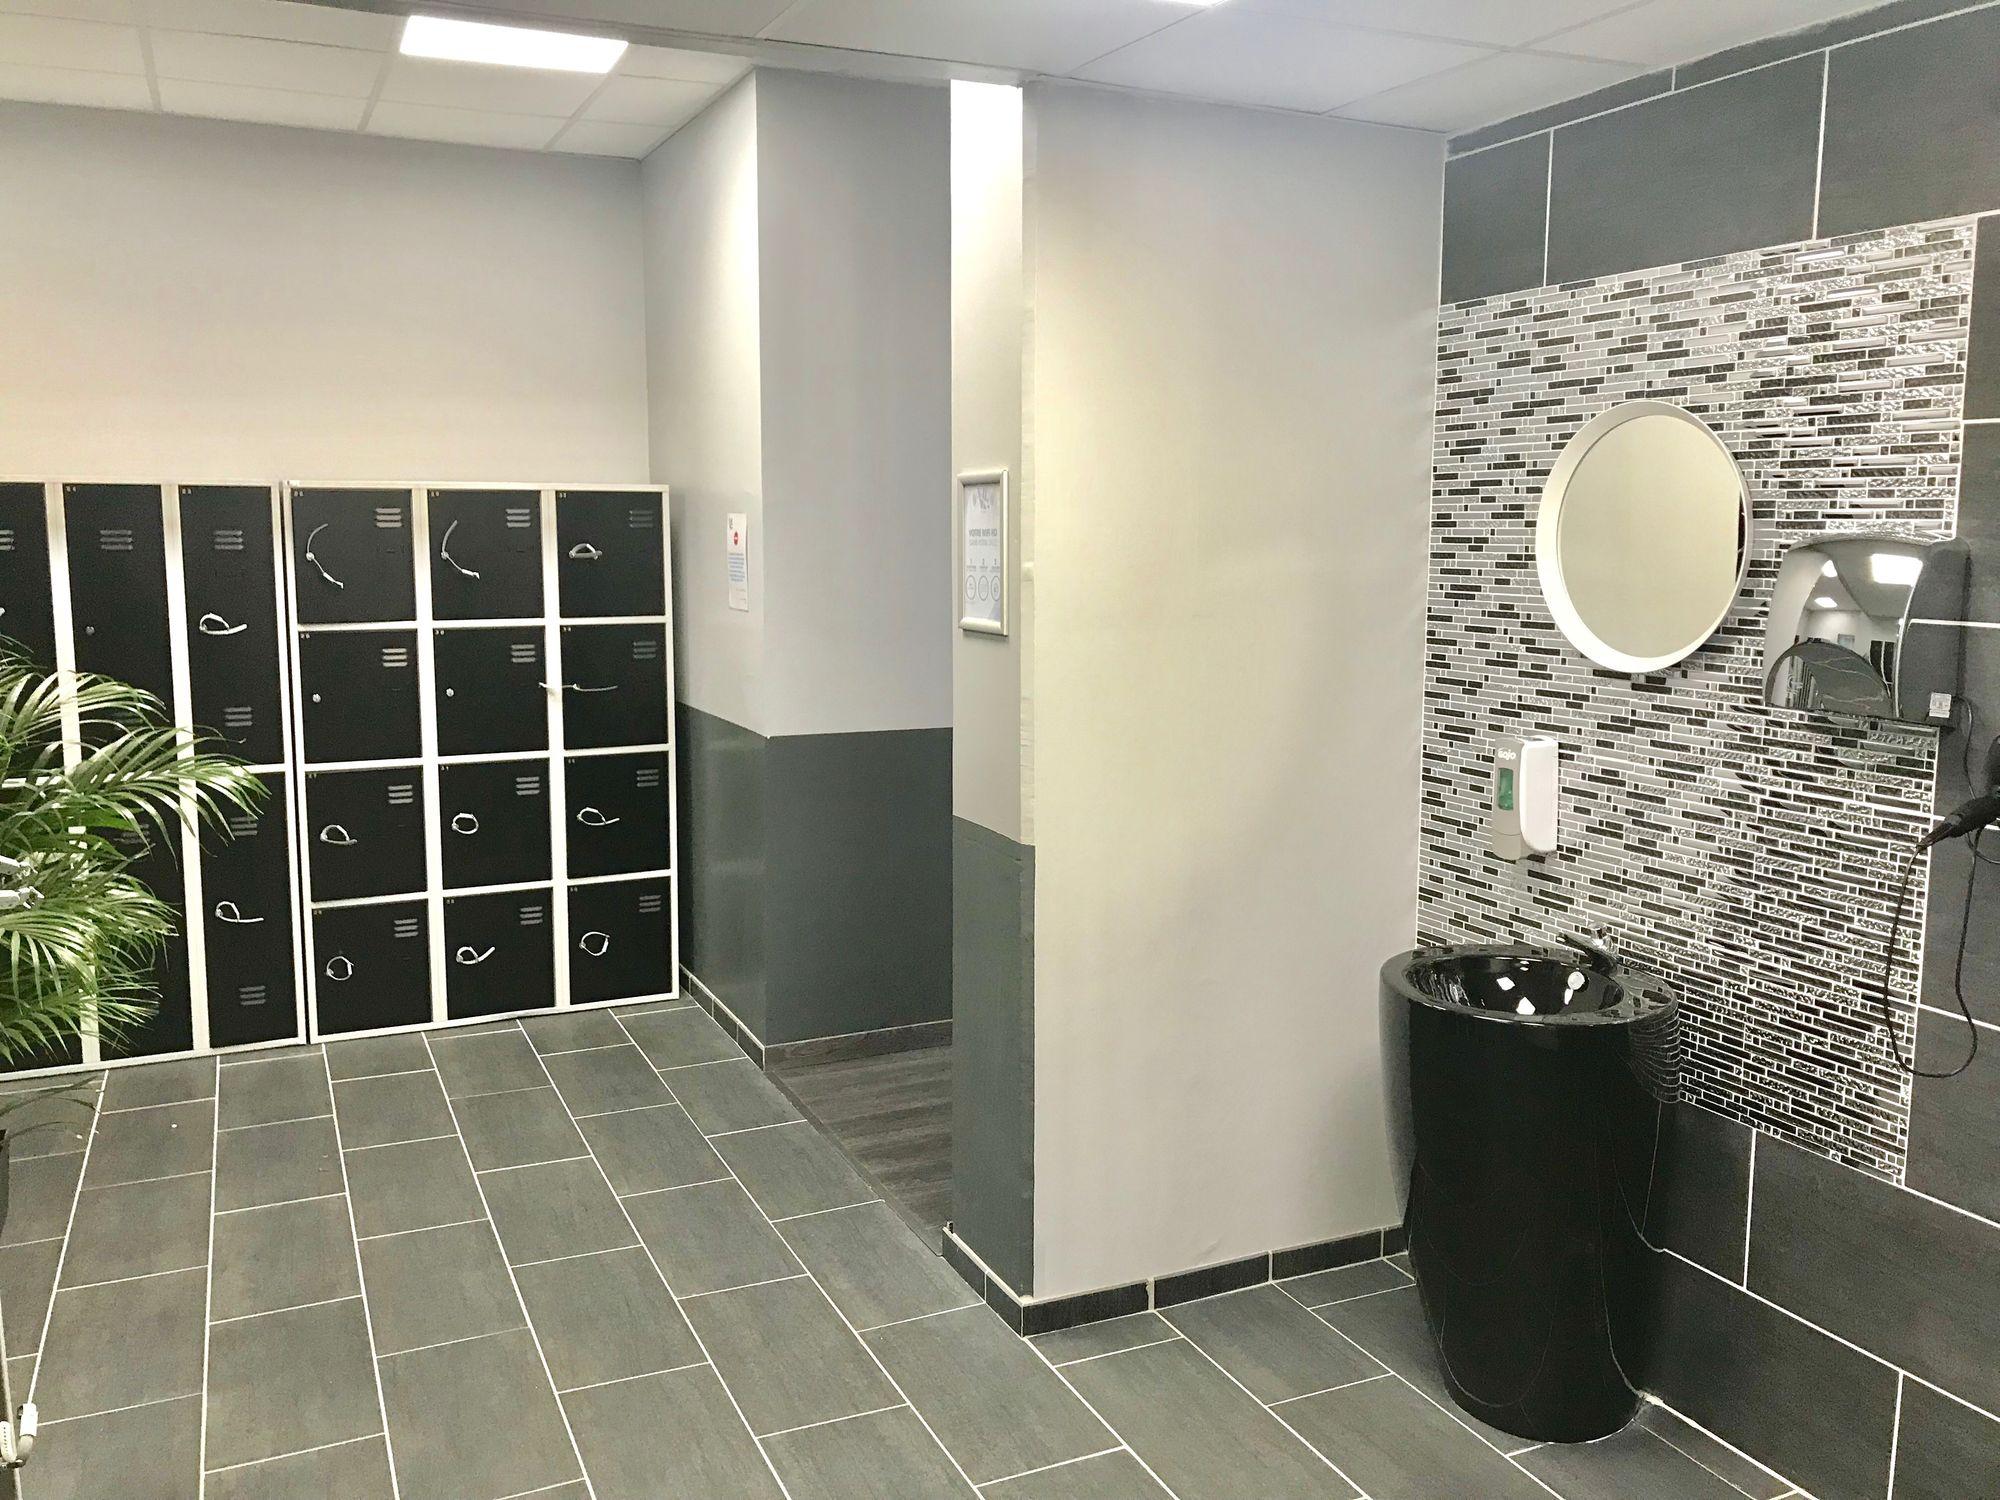 Salle de sport Vita liberté Martigues vestiaires